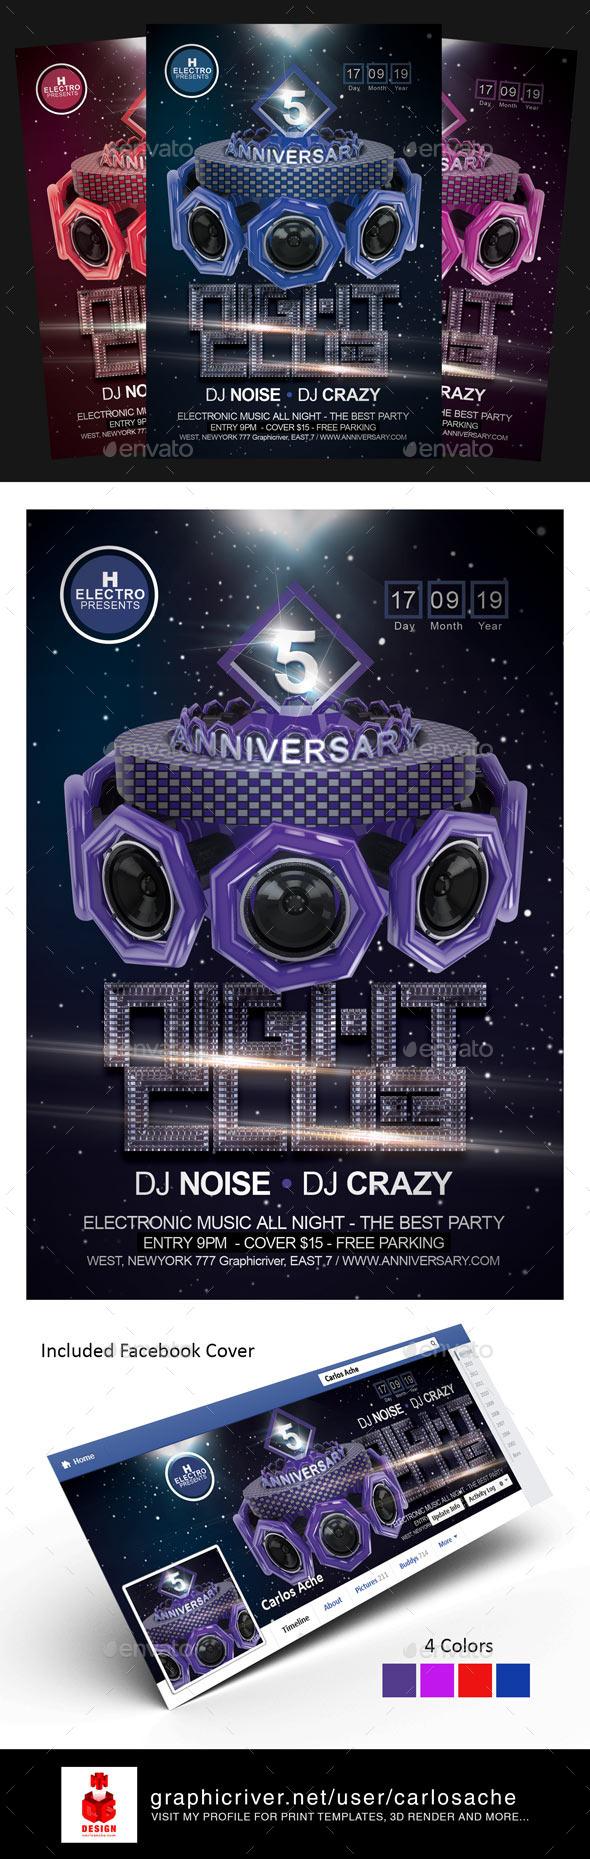 GraphicRiver Anniversary Flyer Template 10803411